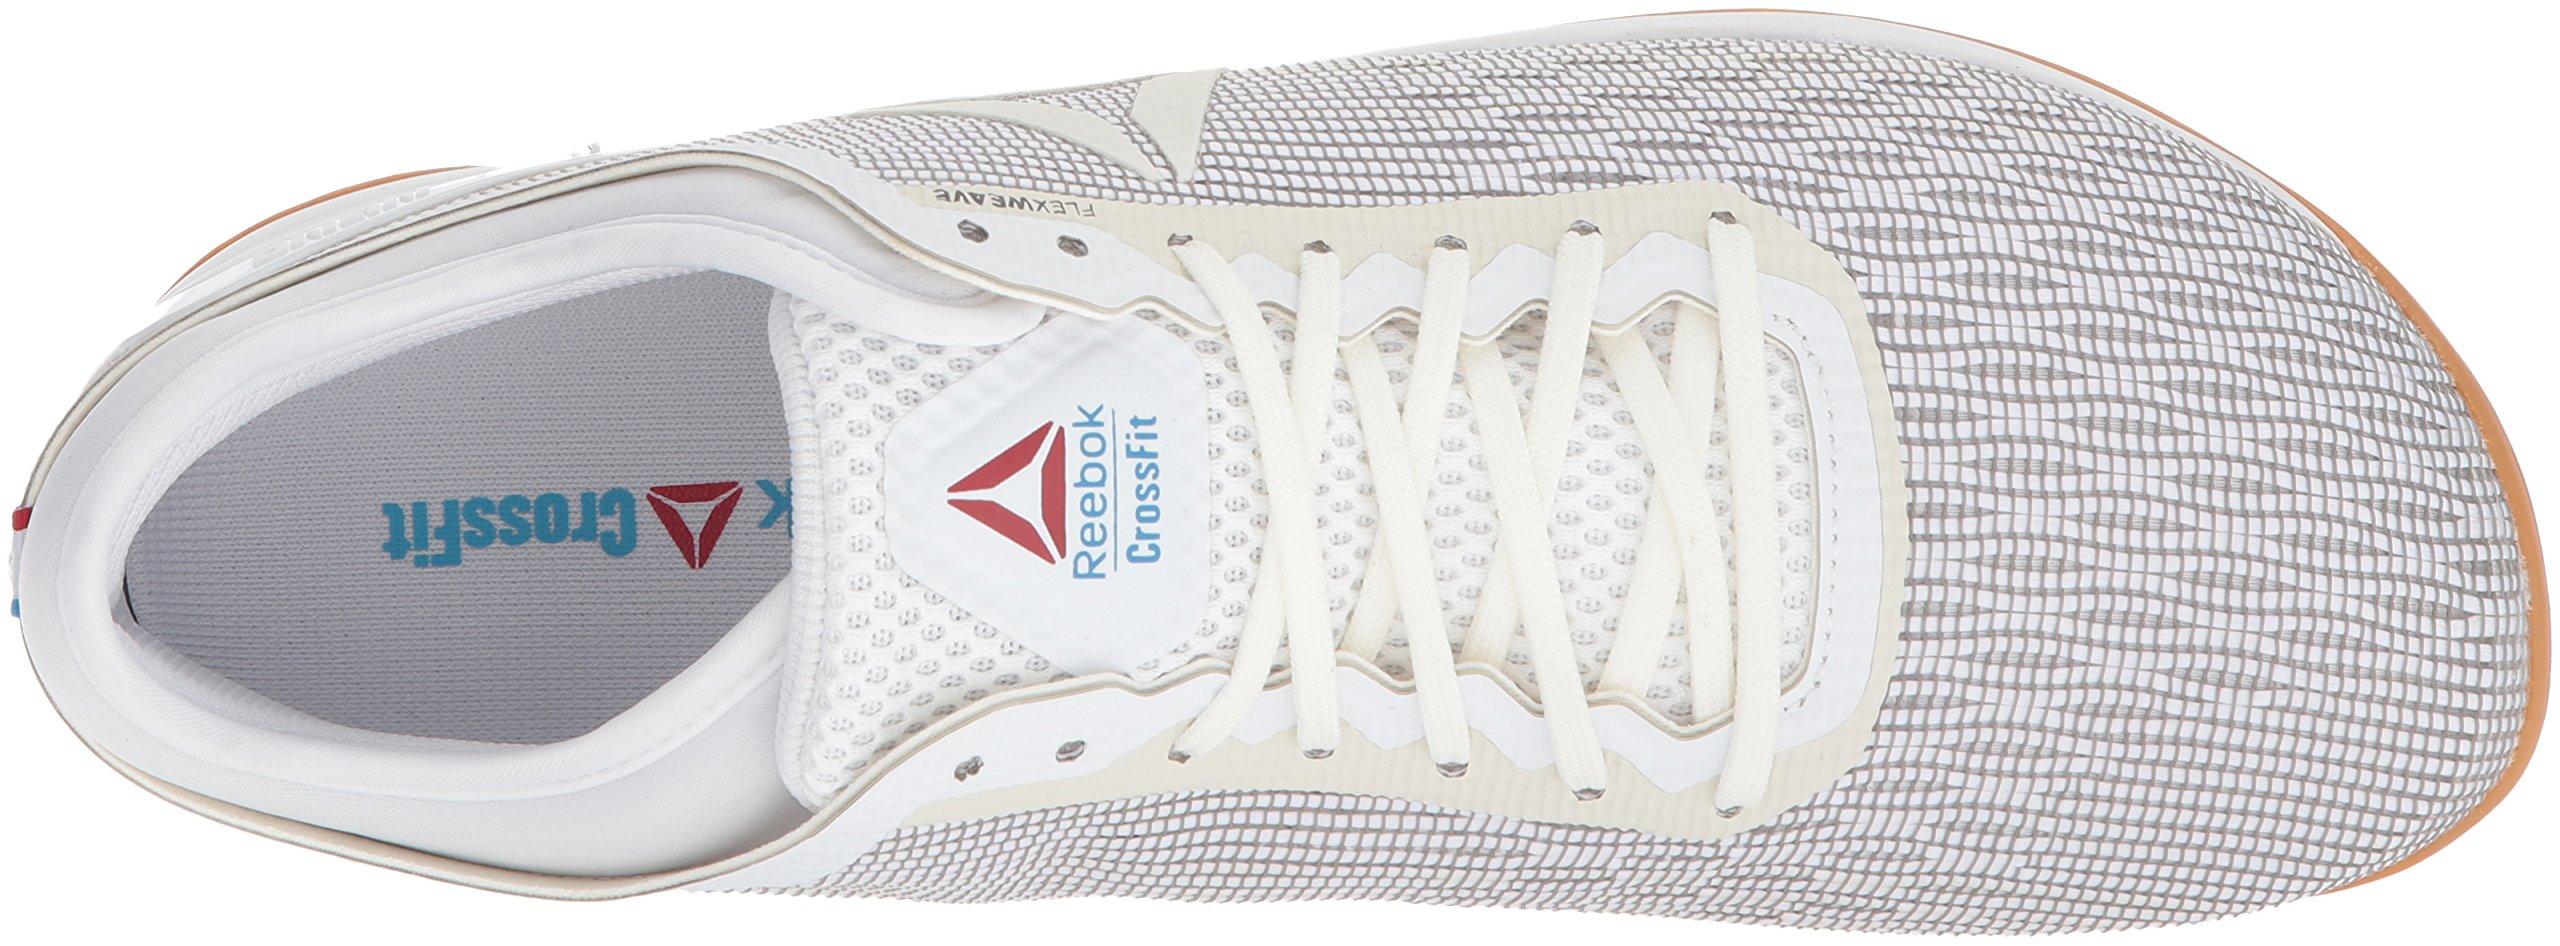 Reebok Men's CROSSFIT Nano 8.0 Flexweave Cross Trainer, White/Classic White/Excellent Red/Blue/Gum, 6.5 M US by Reebok (Image #8)